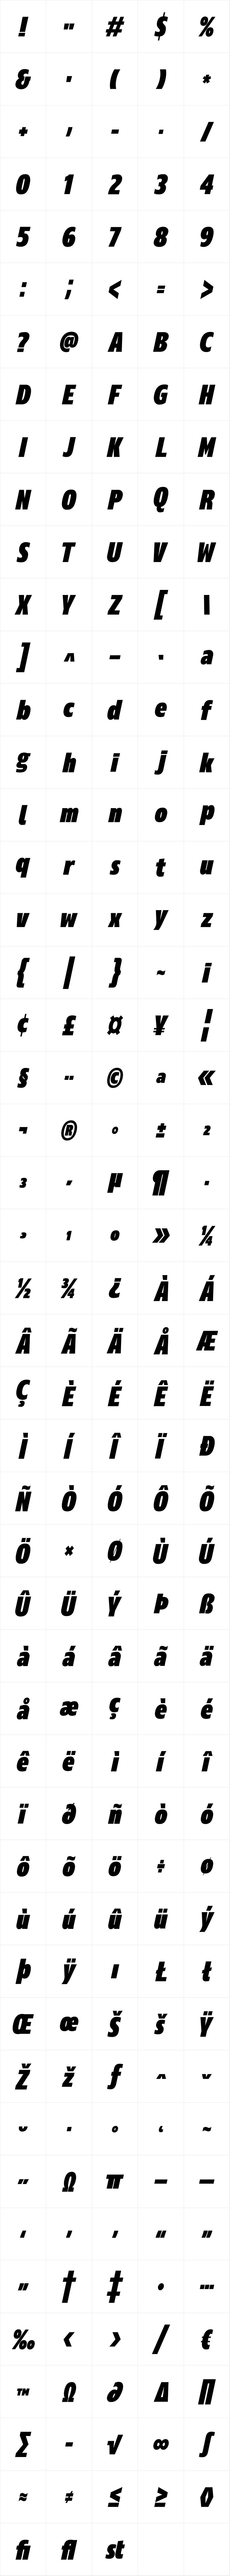 Ramston Bold Condensed Italic